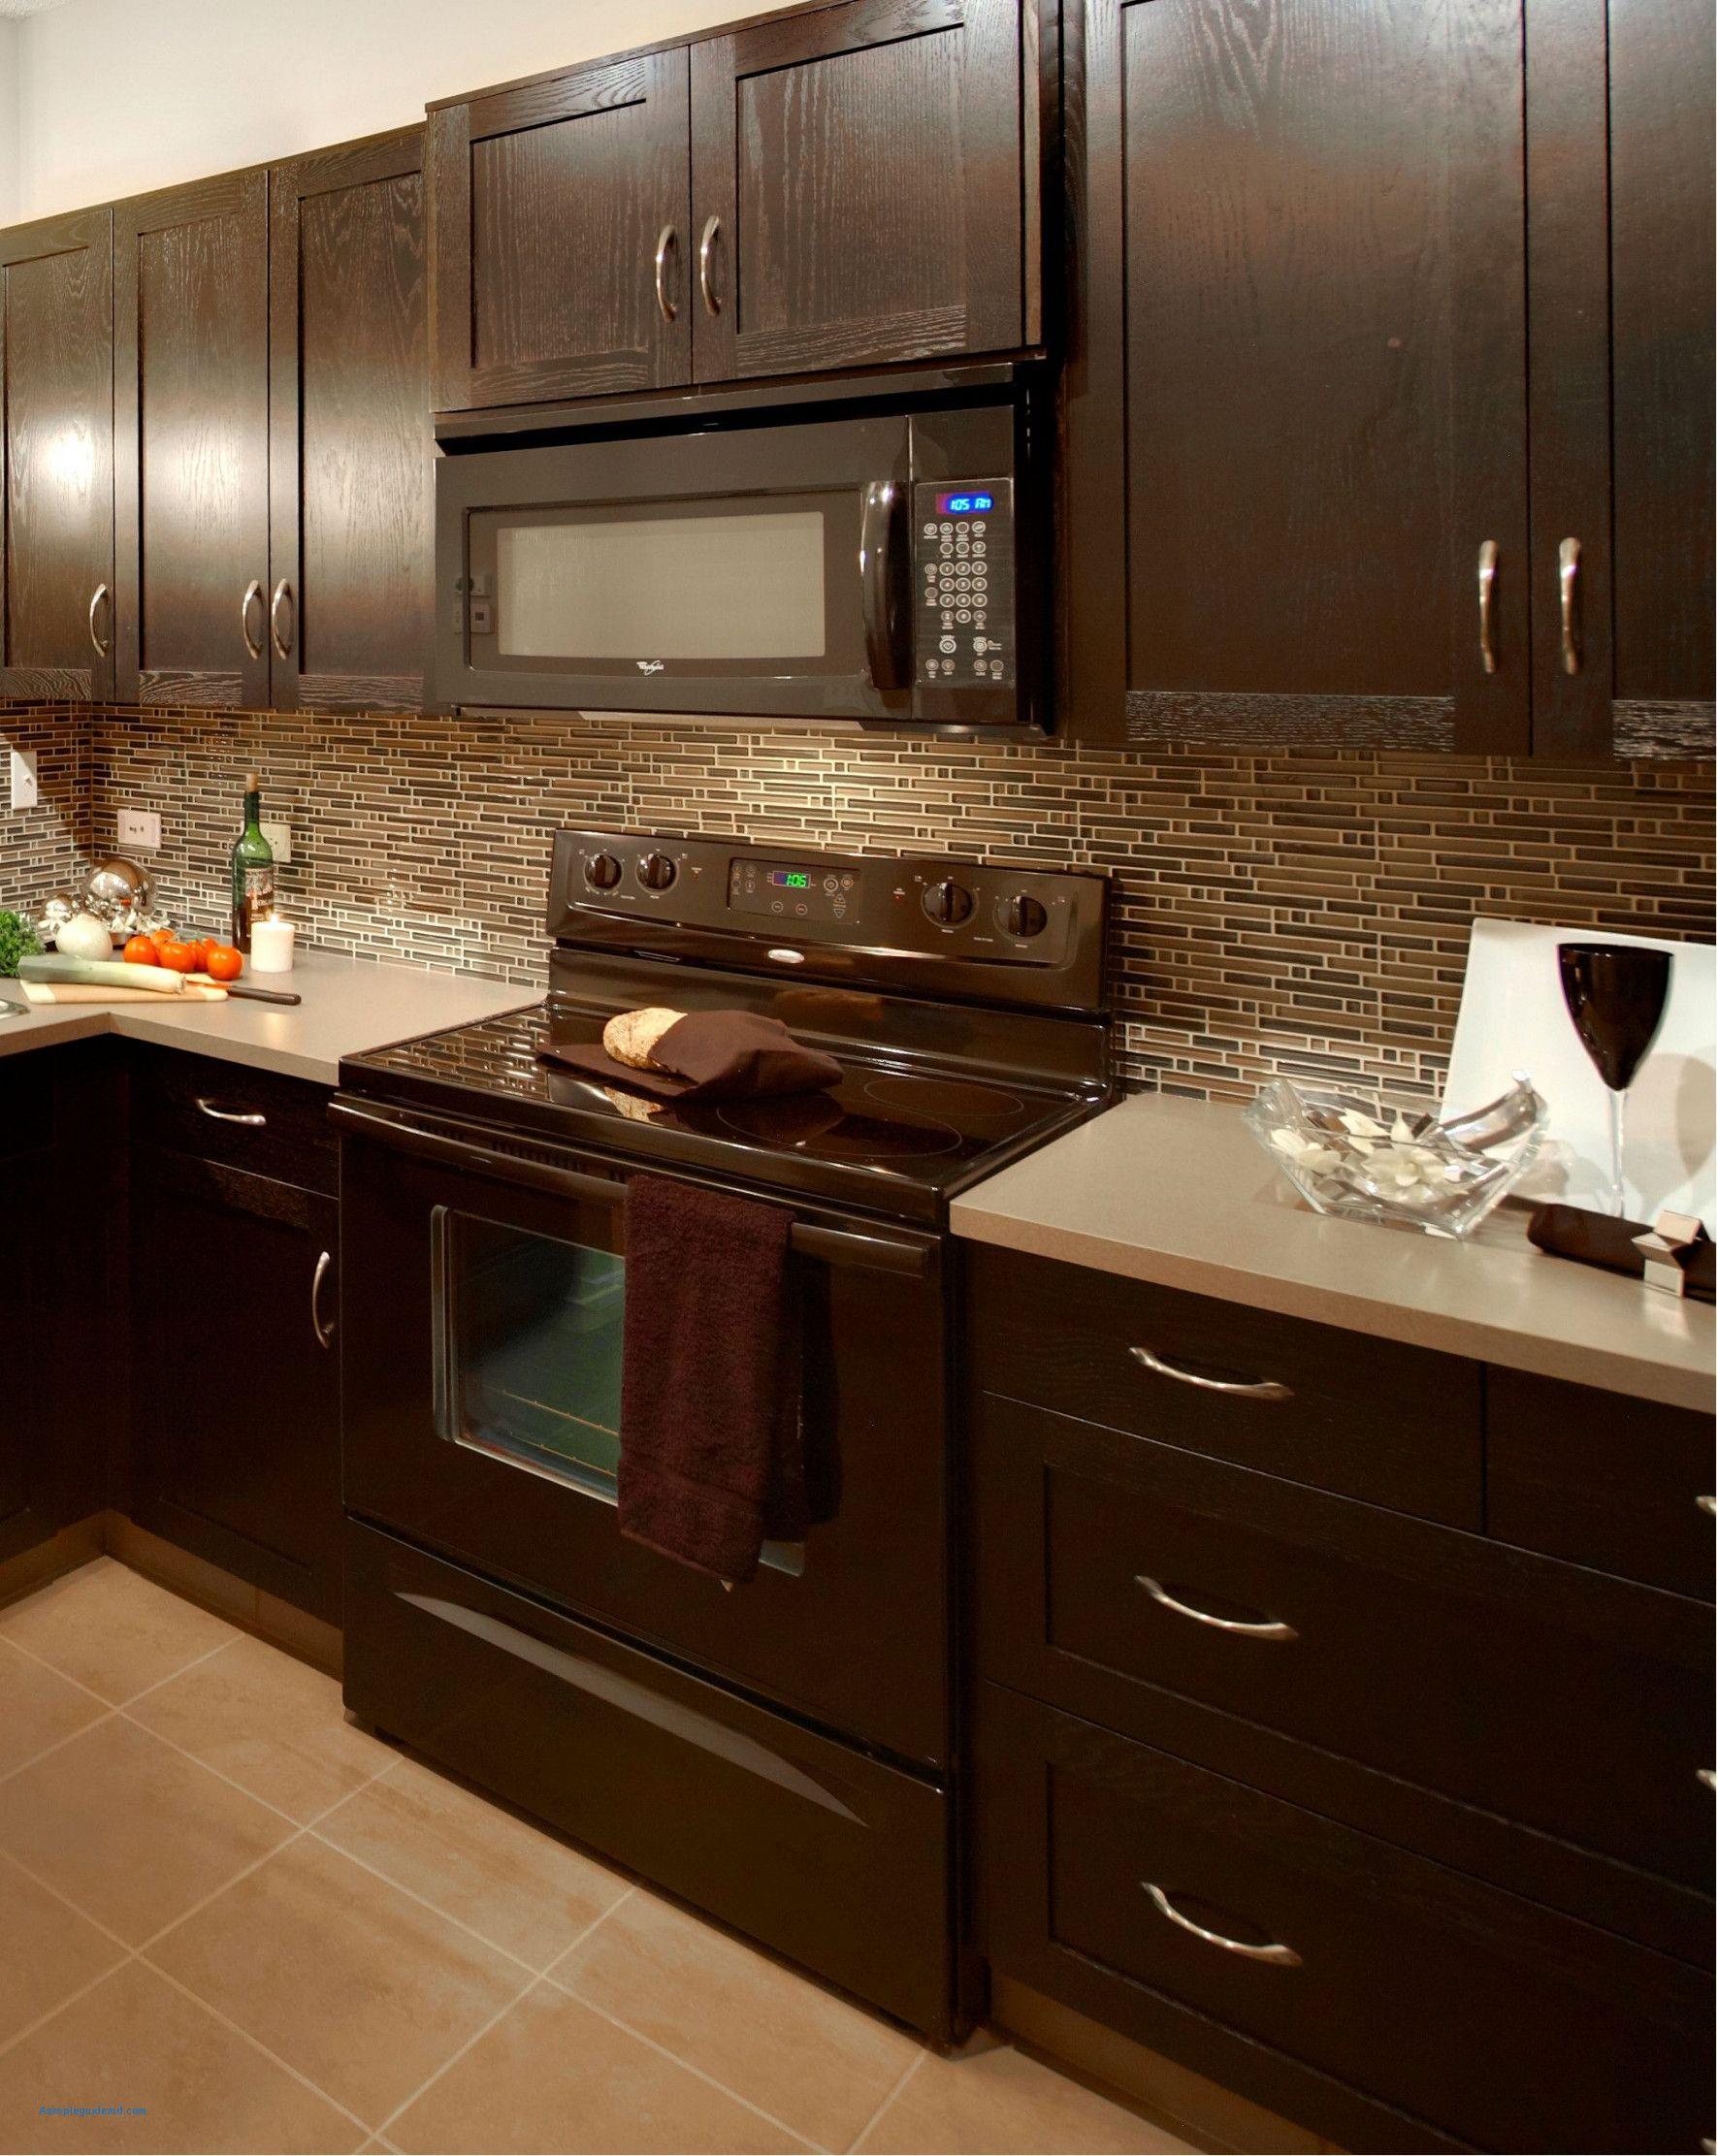 Walnut Kitchen Cabinets Granite Countertops Luxury Modern ... on Modern Backsplash For Dark Countertops  id=15696